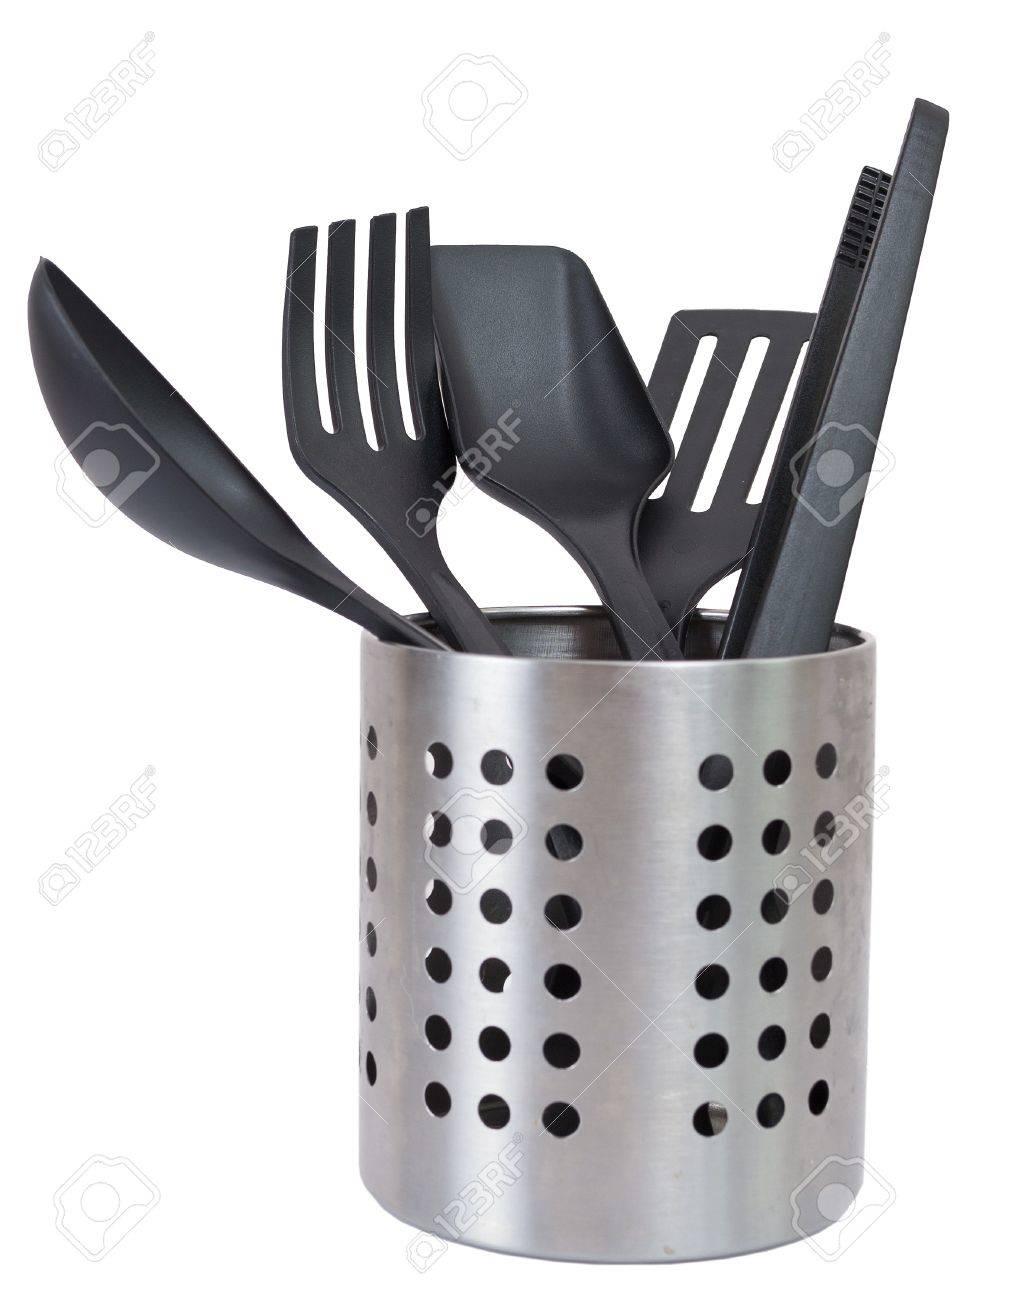 Kitchen utensils in a utensil holder isolated against a white..